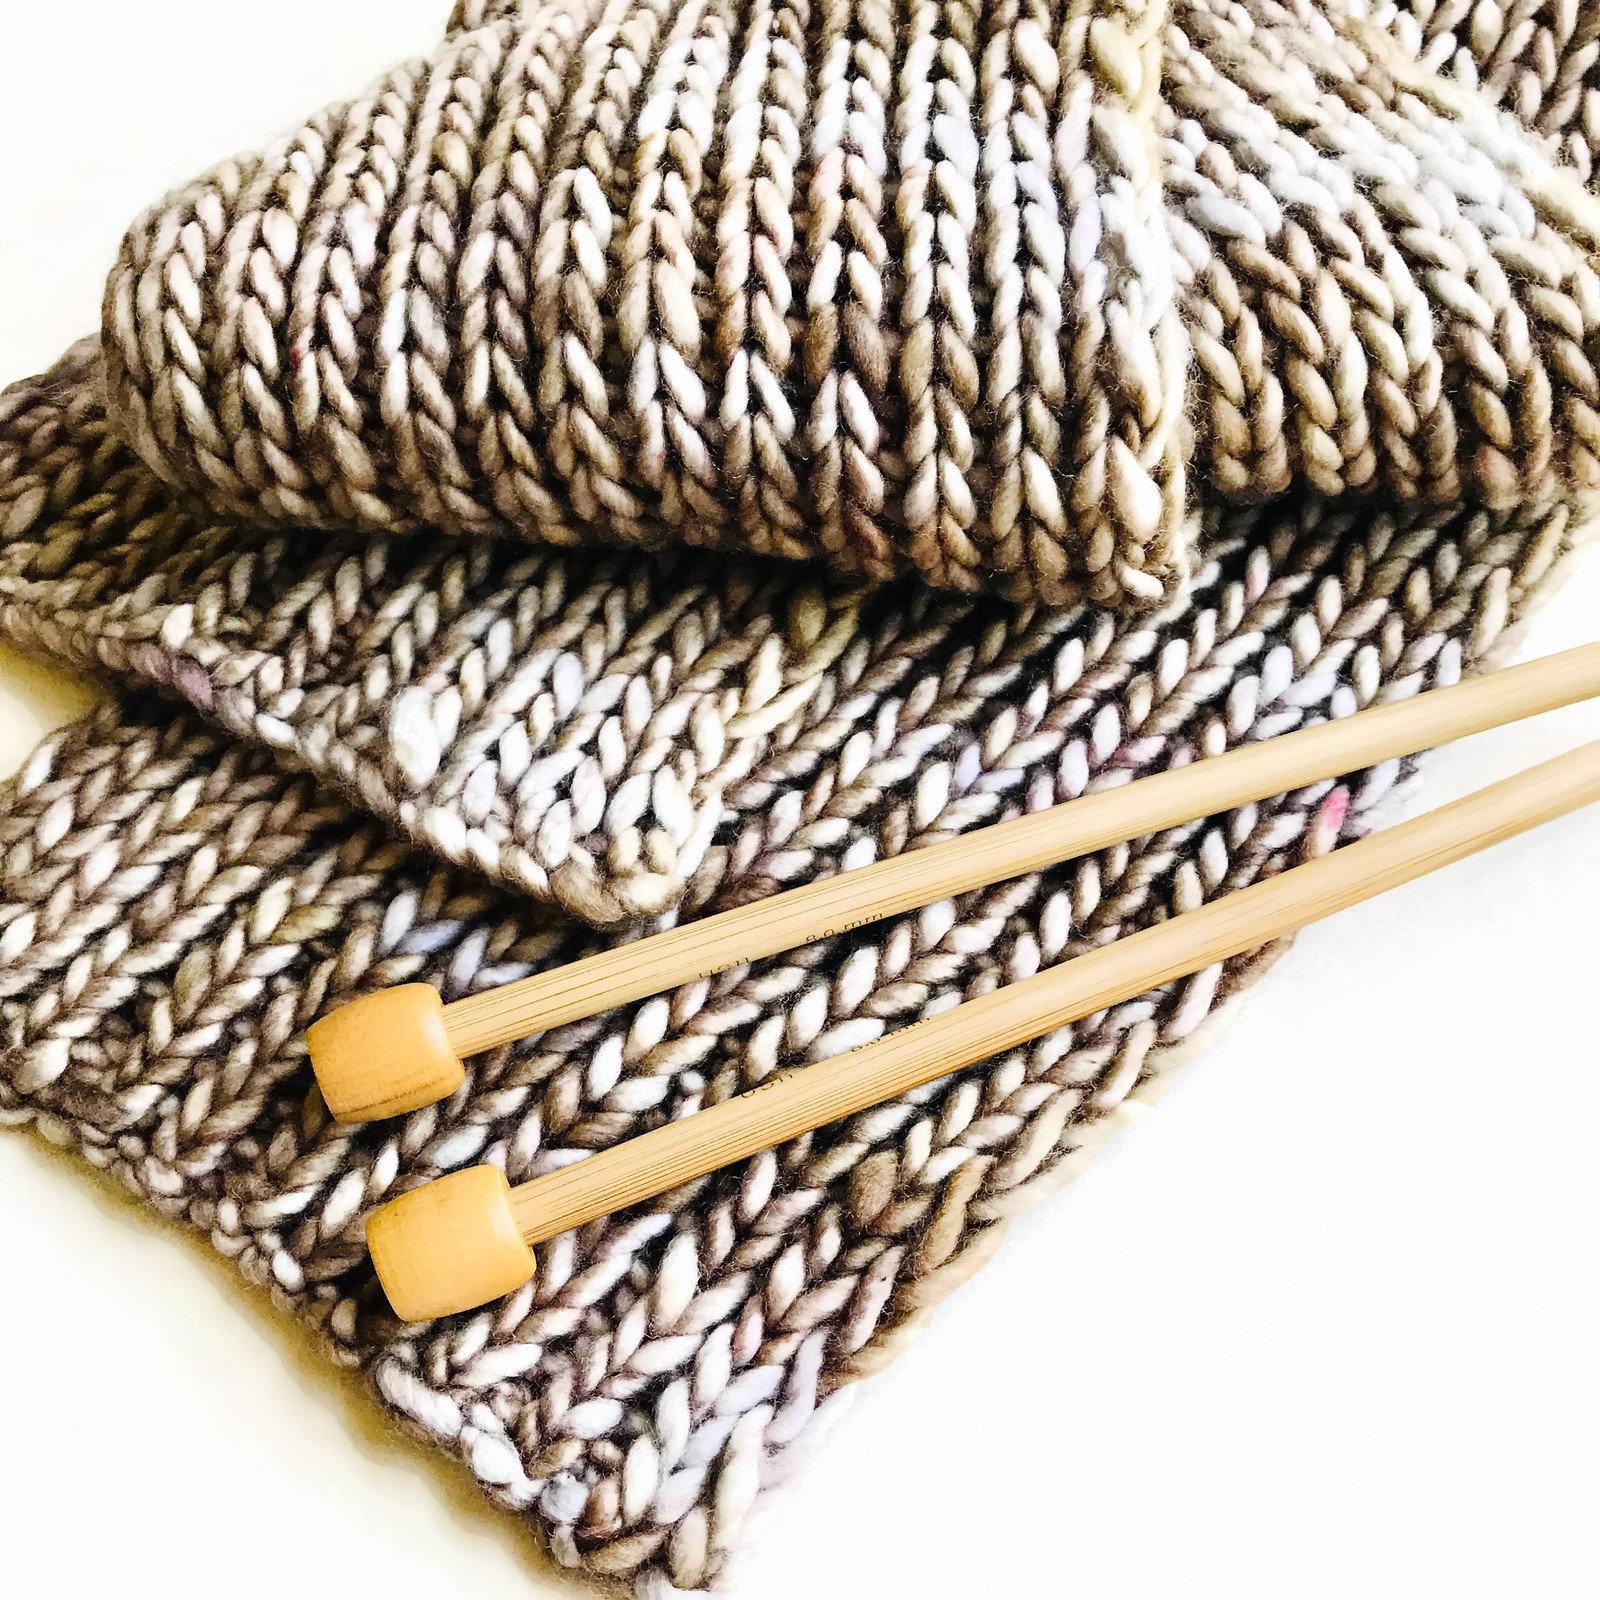 Scarf 2 Knitting Pattern Simple 1x1 Rib Stitch Scarf Pdf Download